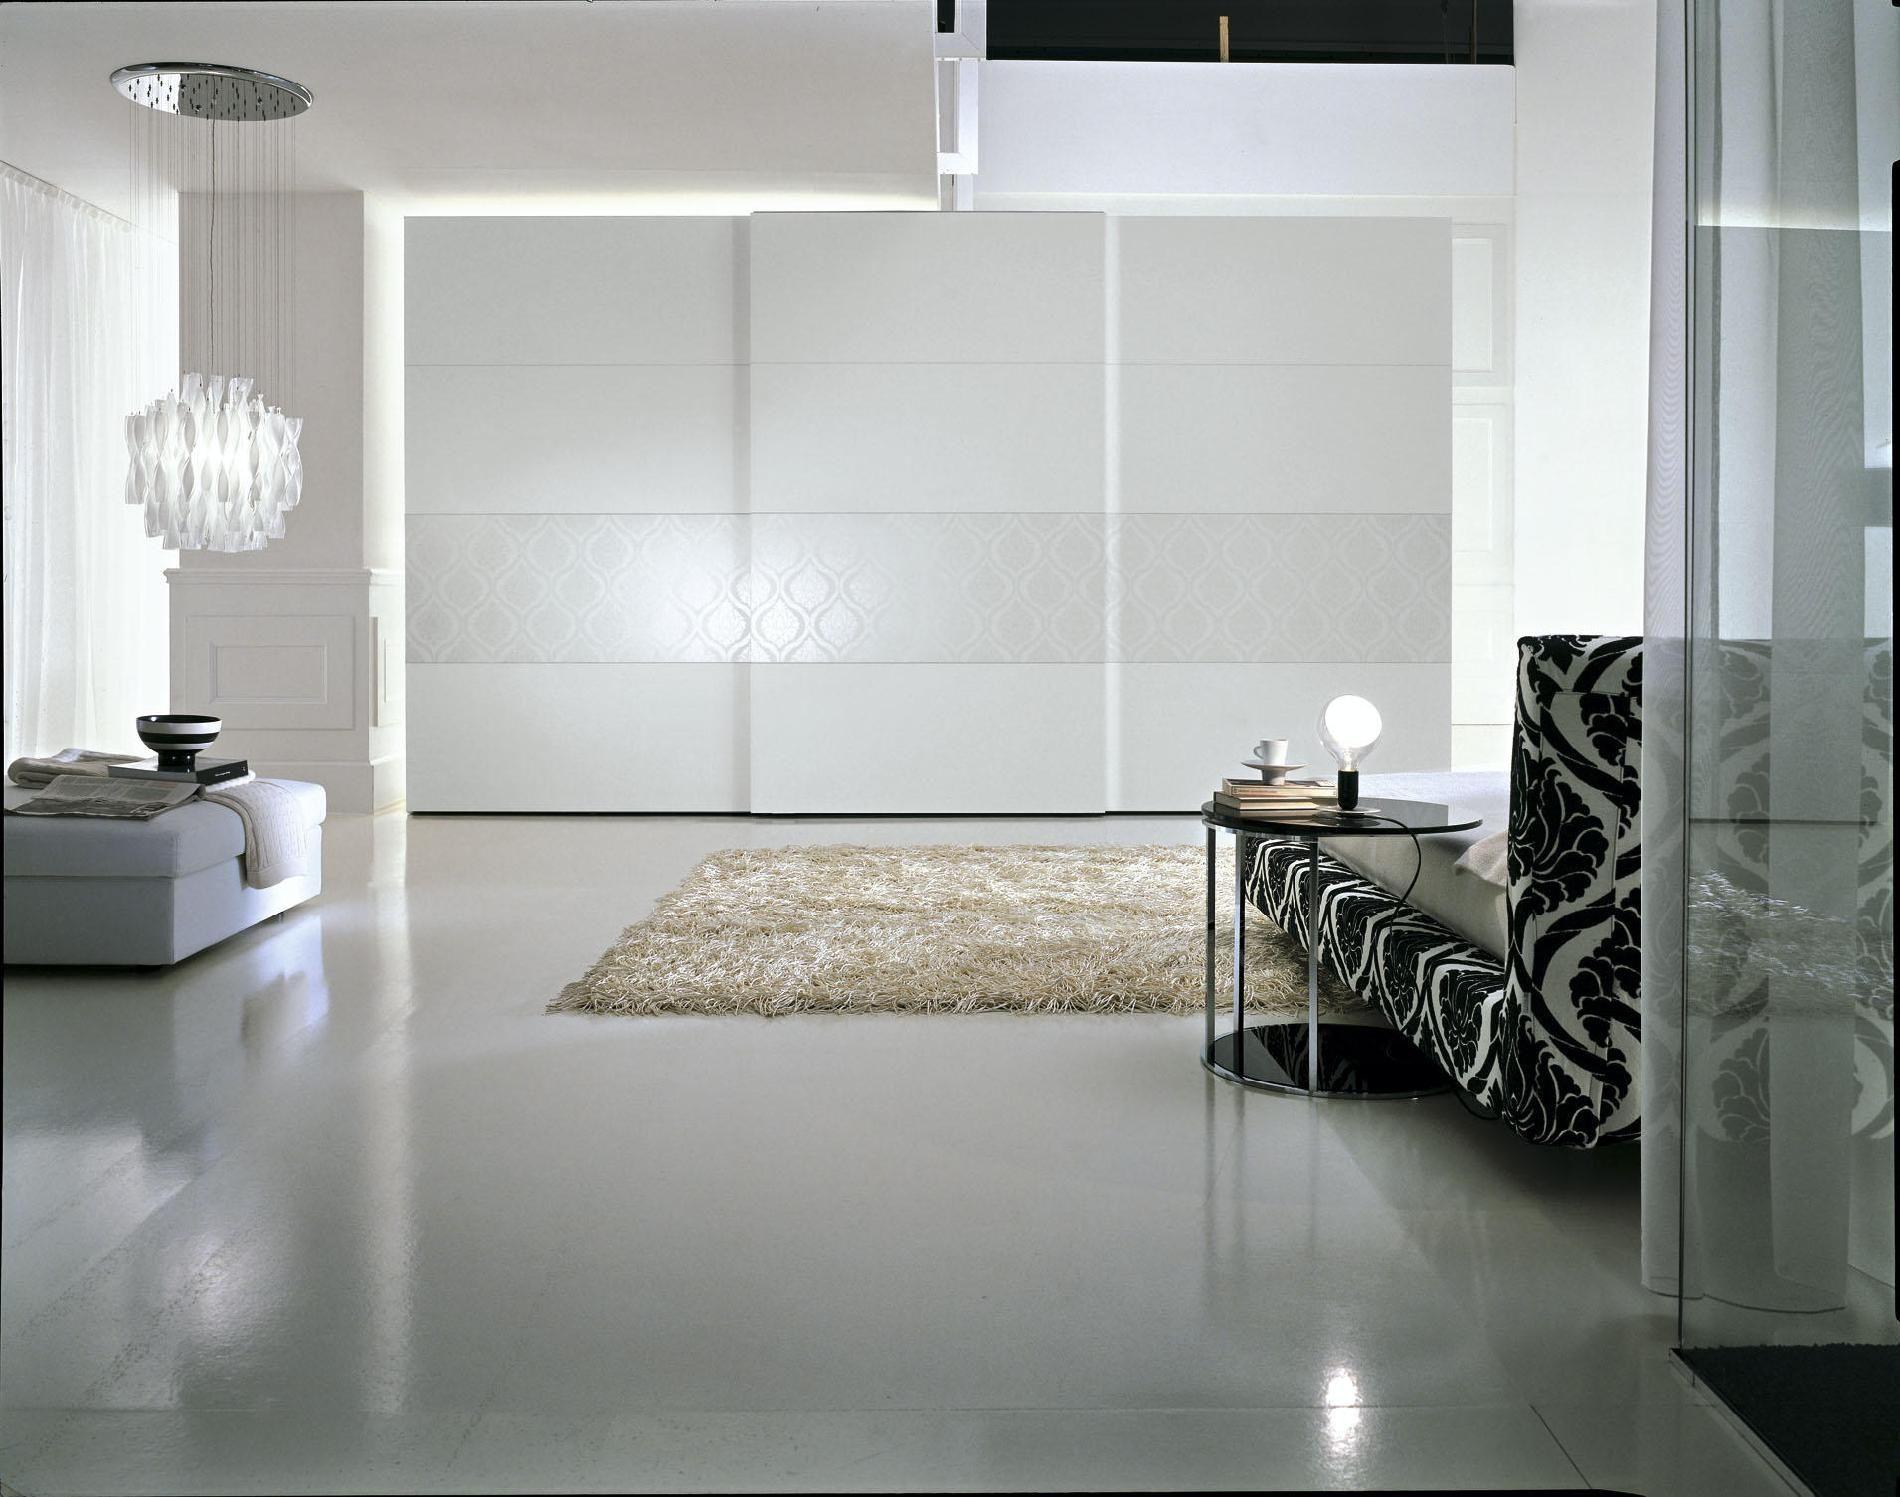 http://www.inmagz.com Inspirational La Closet Design  The Modern Wardrobe Interior Magazine